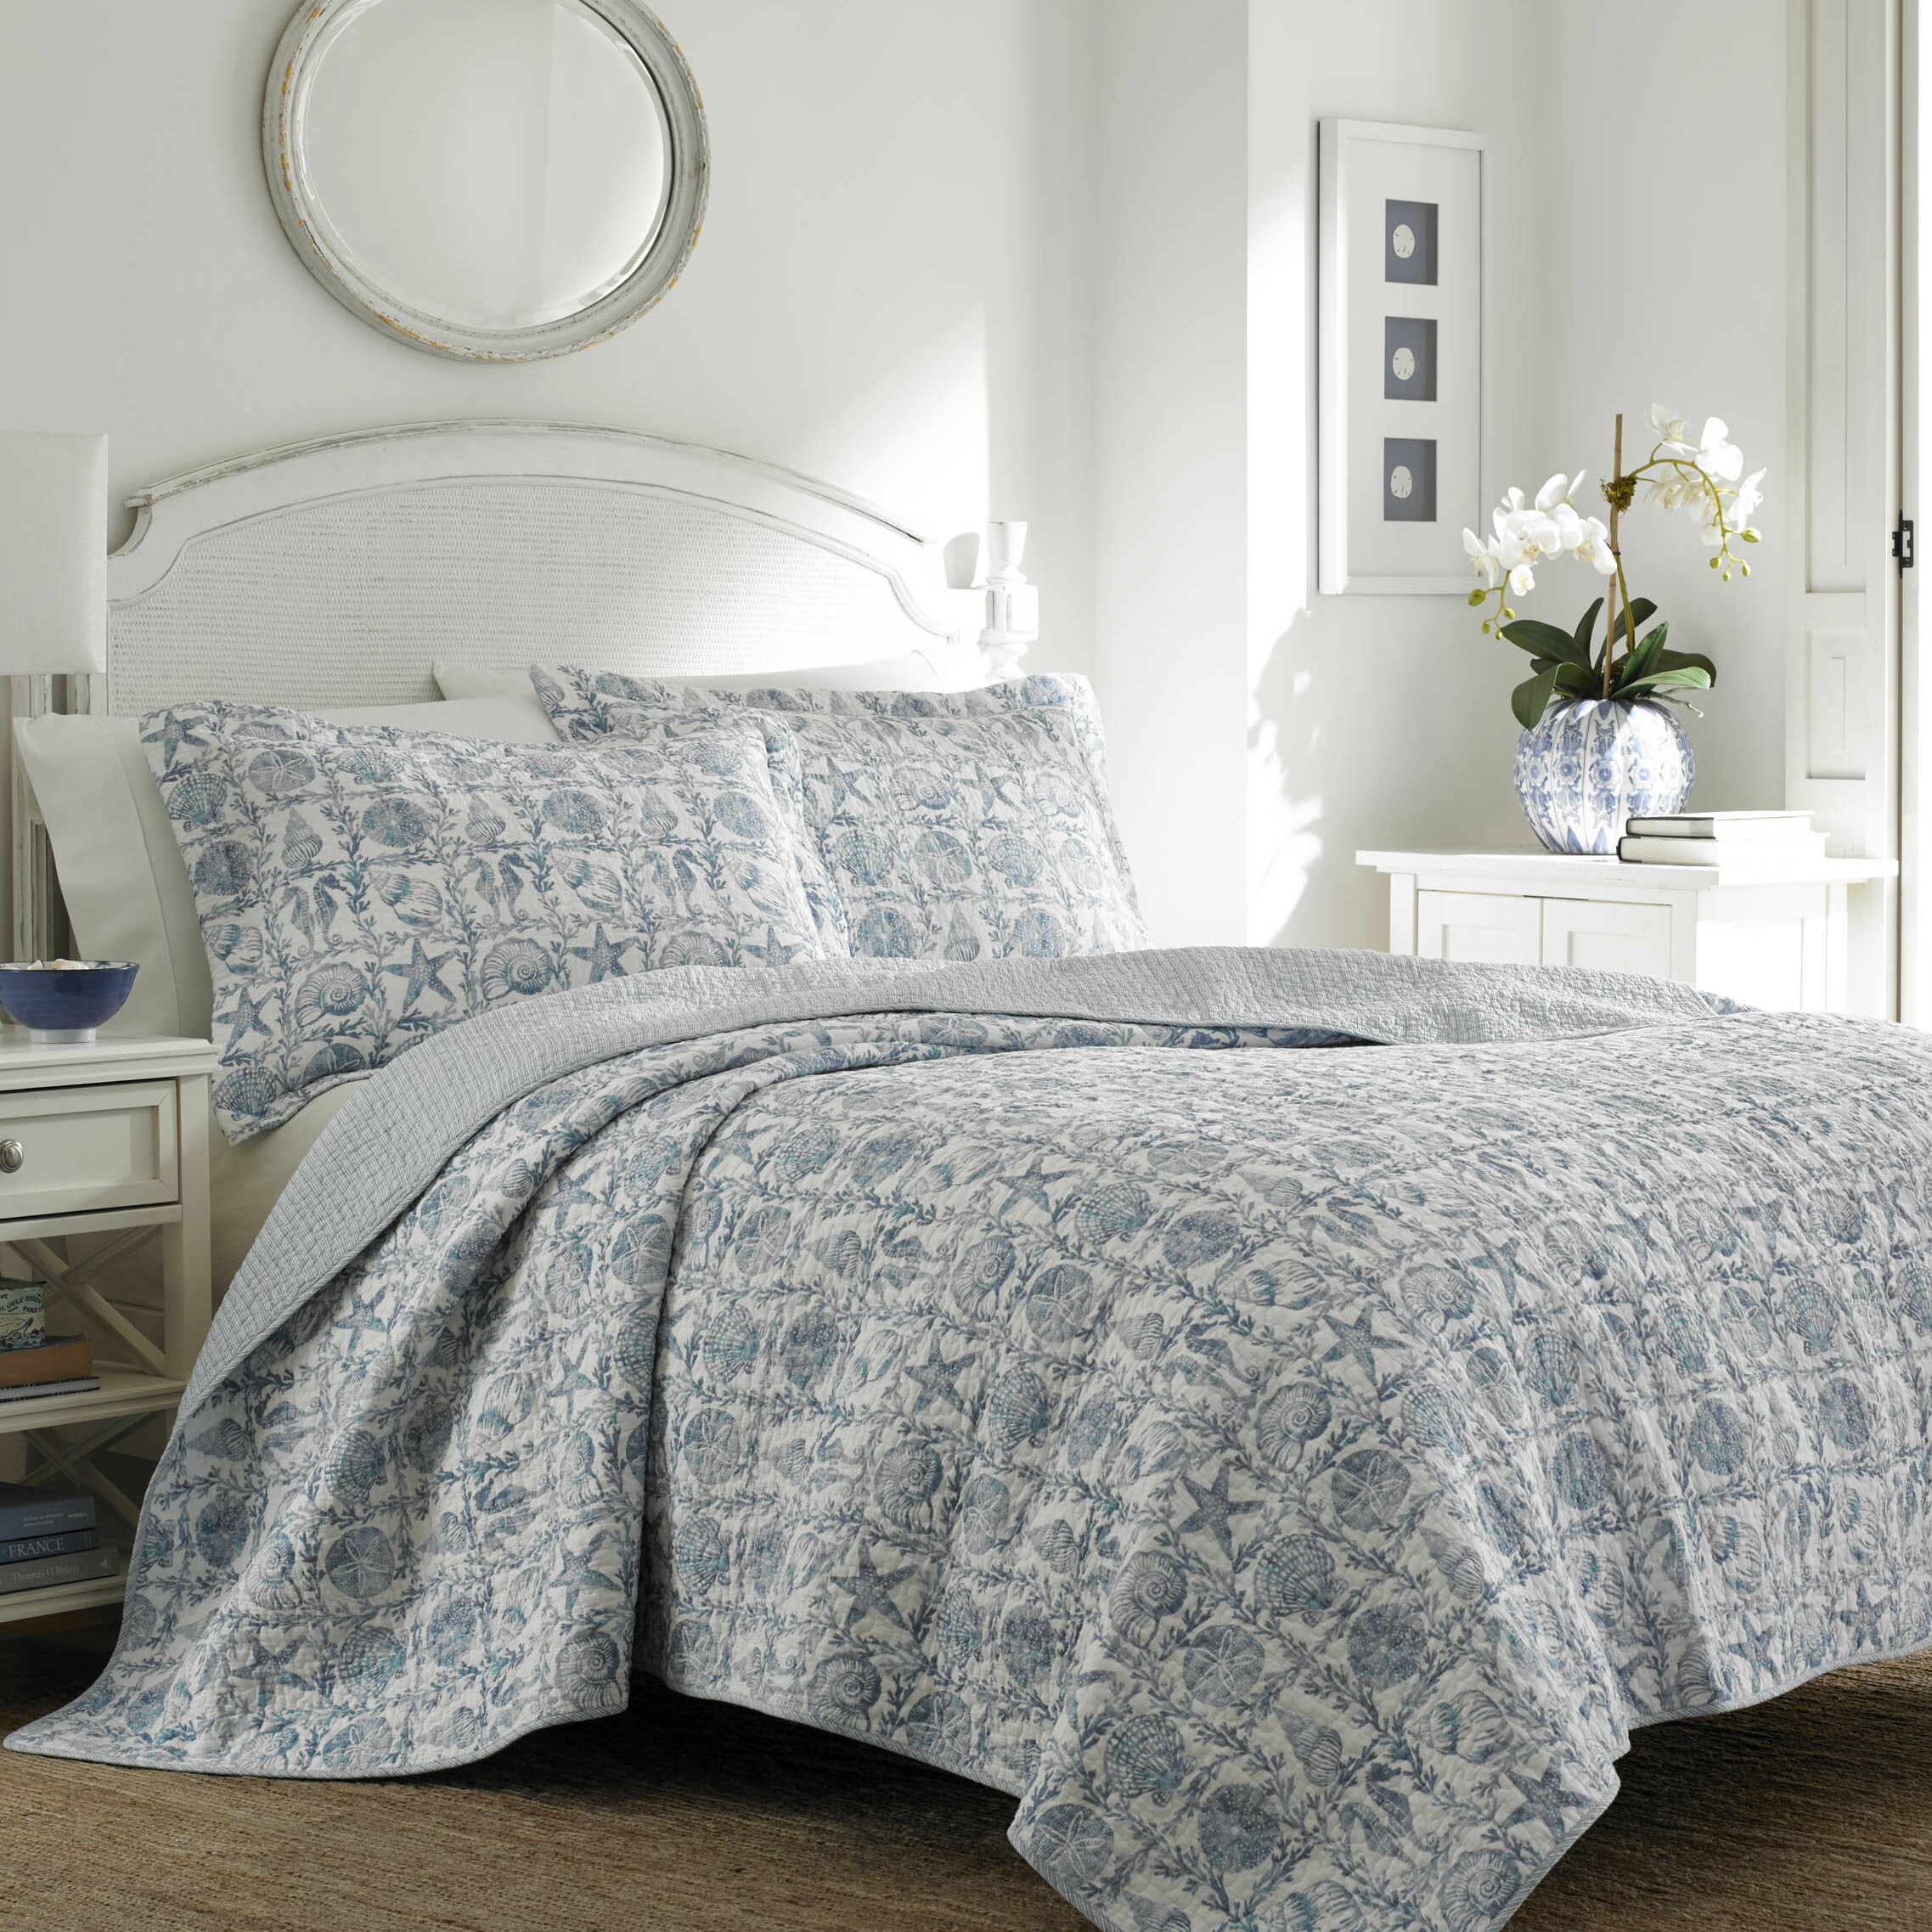 Laura Ashley Bedroom Laura Ashley Home Bettina Beach Reversible Quilt Set Reviews